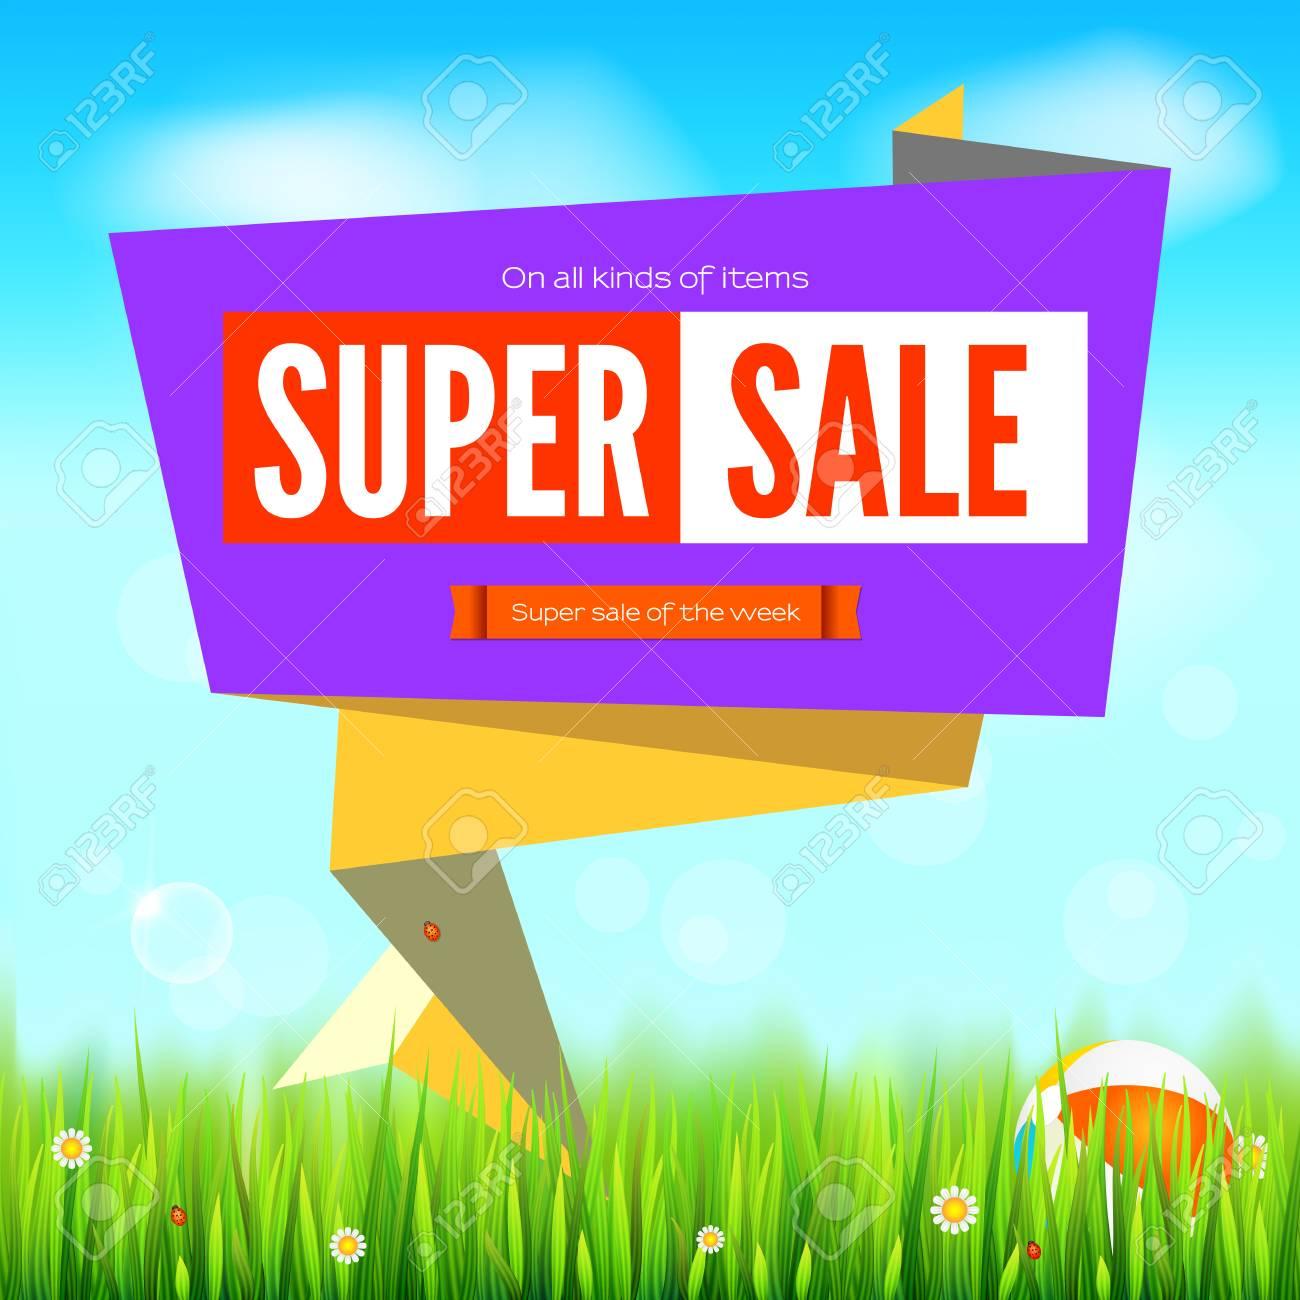 Super sale summer background cut paper art style for ad banner super sale summer background cut paper art style for ad banner grass daisy izmirmasajfo Images